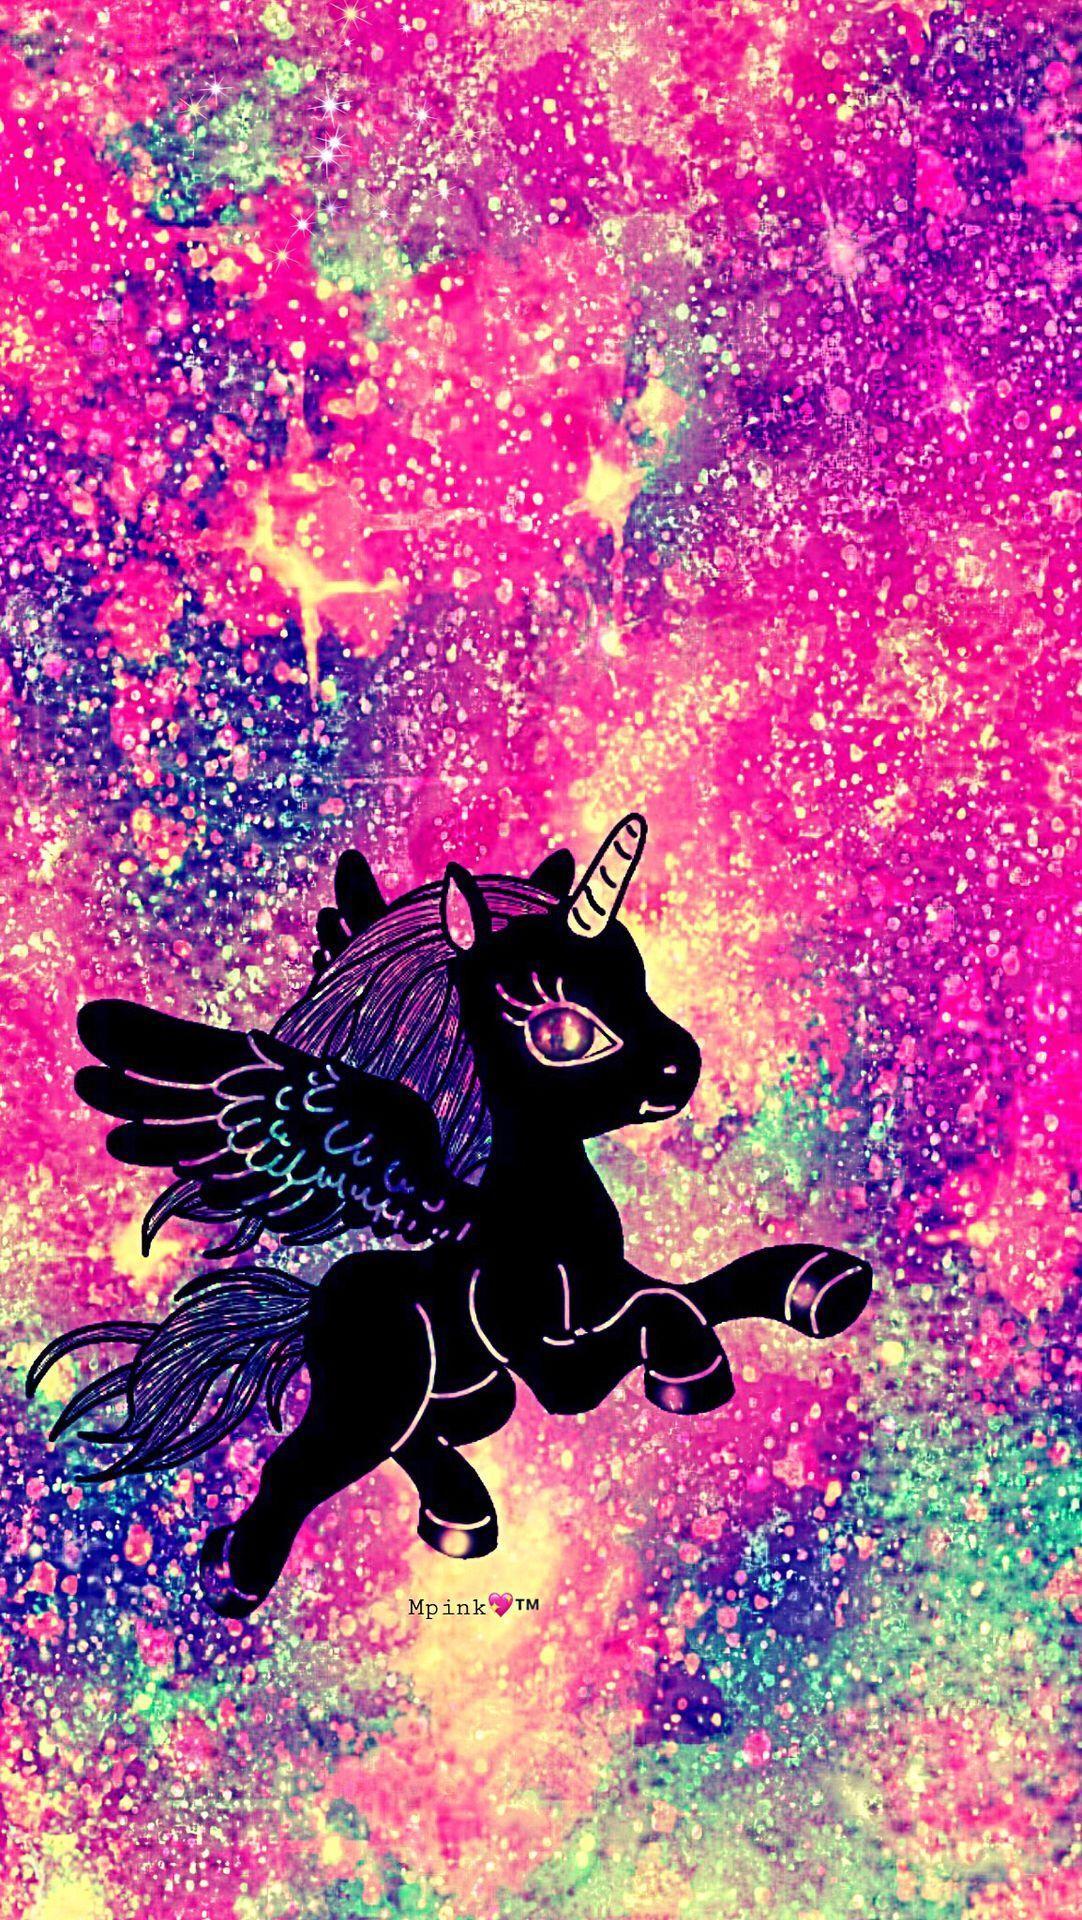 Wallpaper Unicorn Galaxy - Wallpaperzen.org